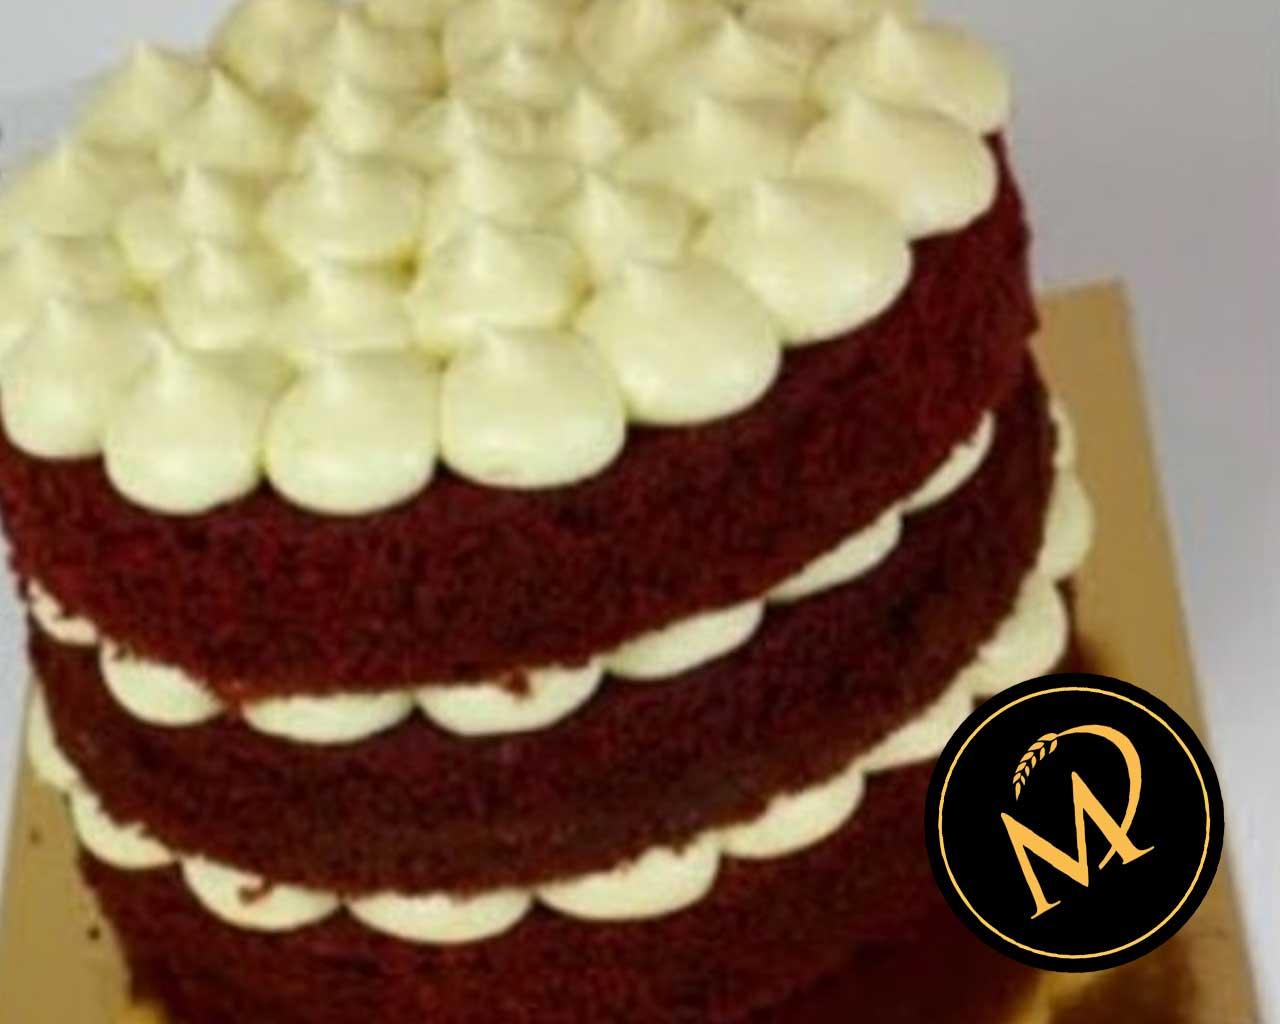 Red Velvet Cake mit Frischkäse Frosting - Rezept Marcel Paa